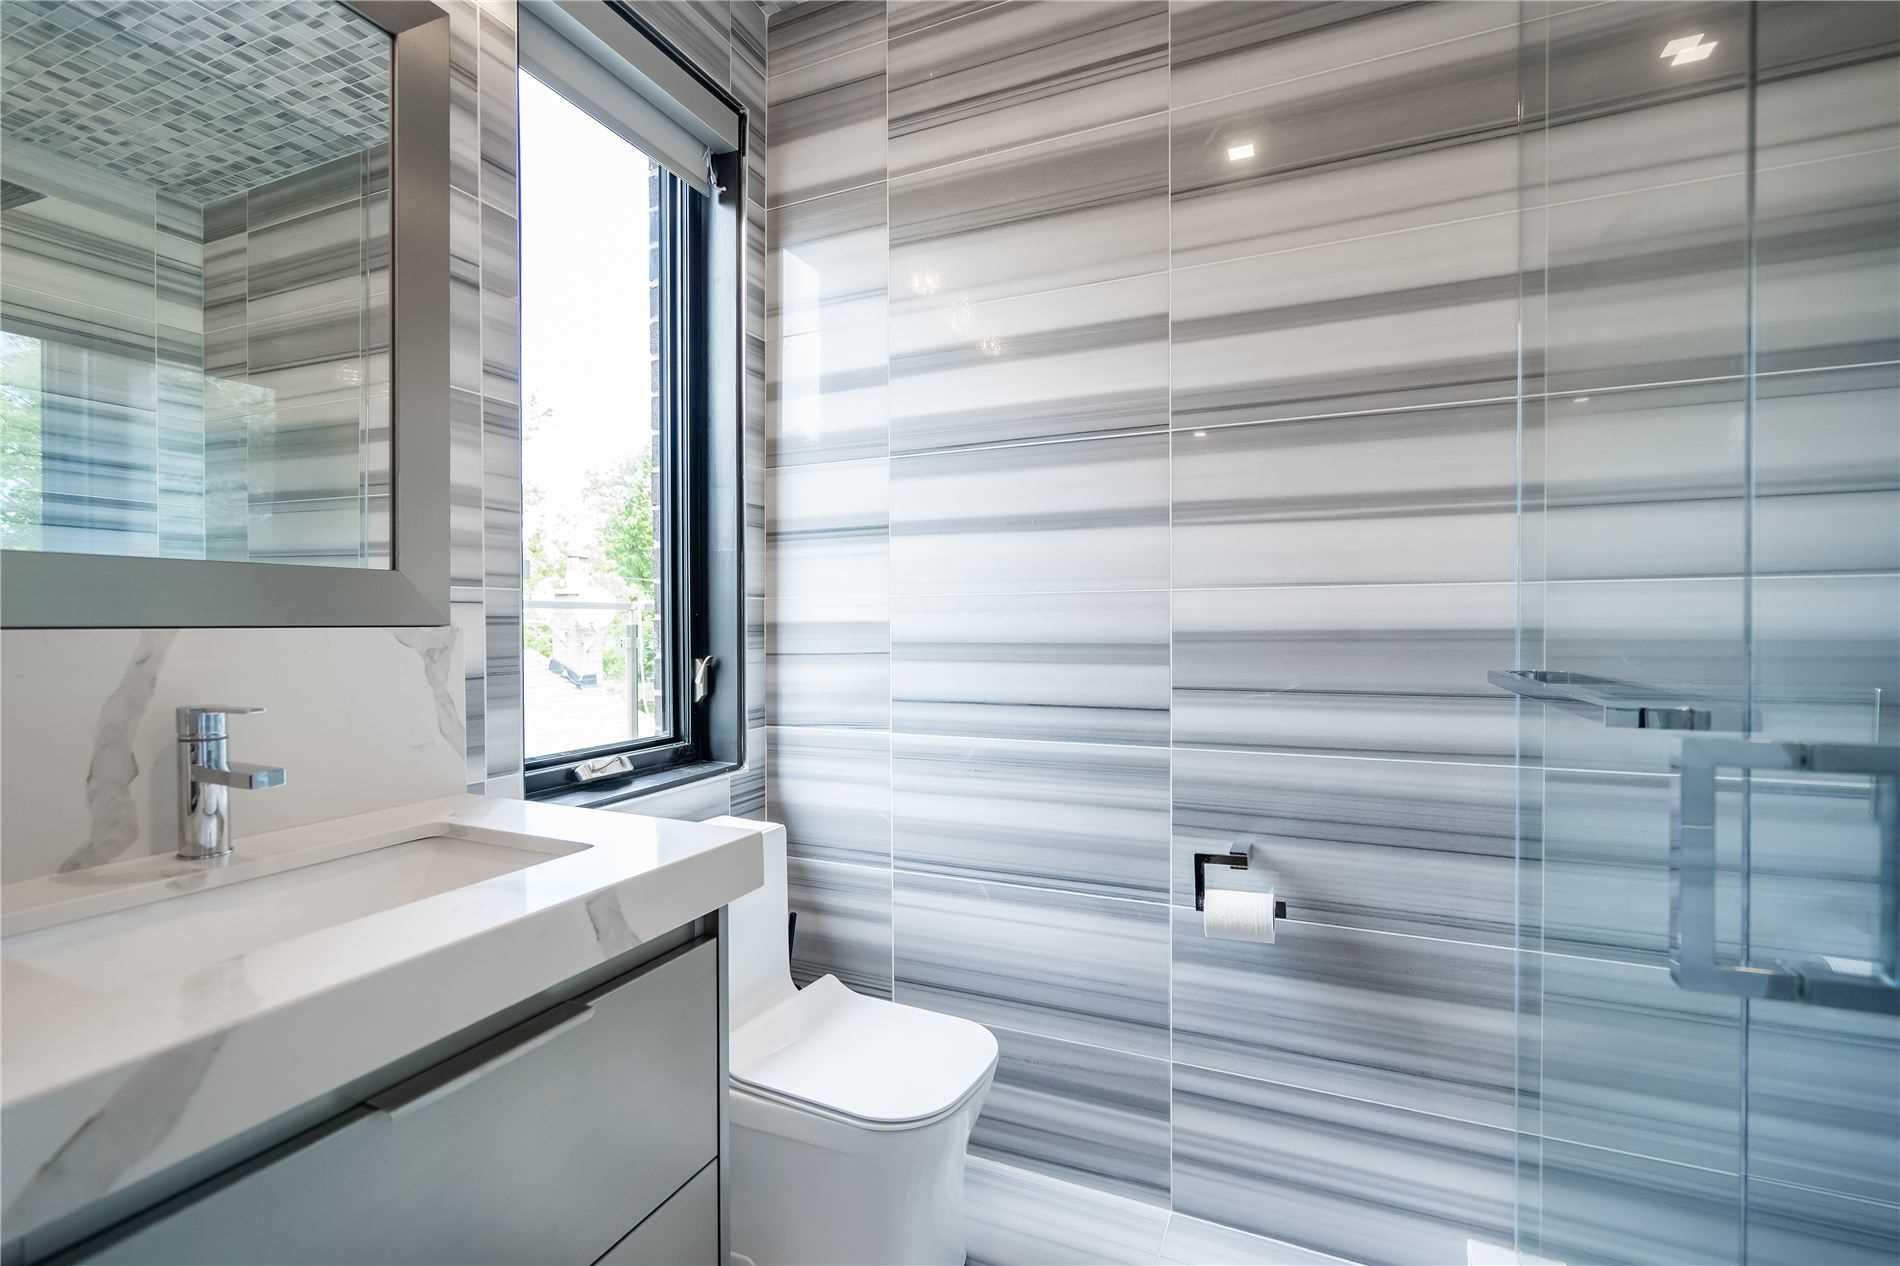 3388 Capricorn Cres, Mississauga, Ontario L4T1S4, 5 Bedrooms Bedrooms, 10 Rooms Rooms,7 BathroomsBathrooms,Detached,For Sale,Capricorn,W5361626